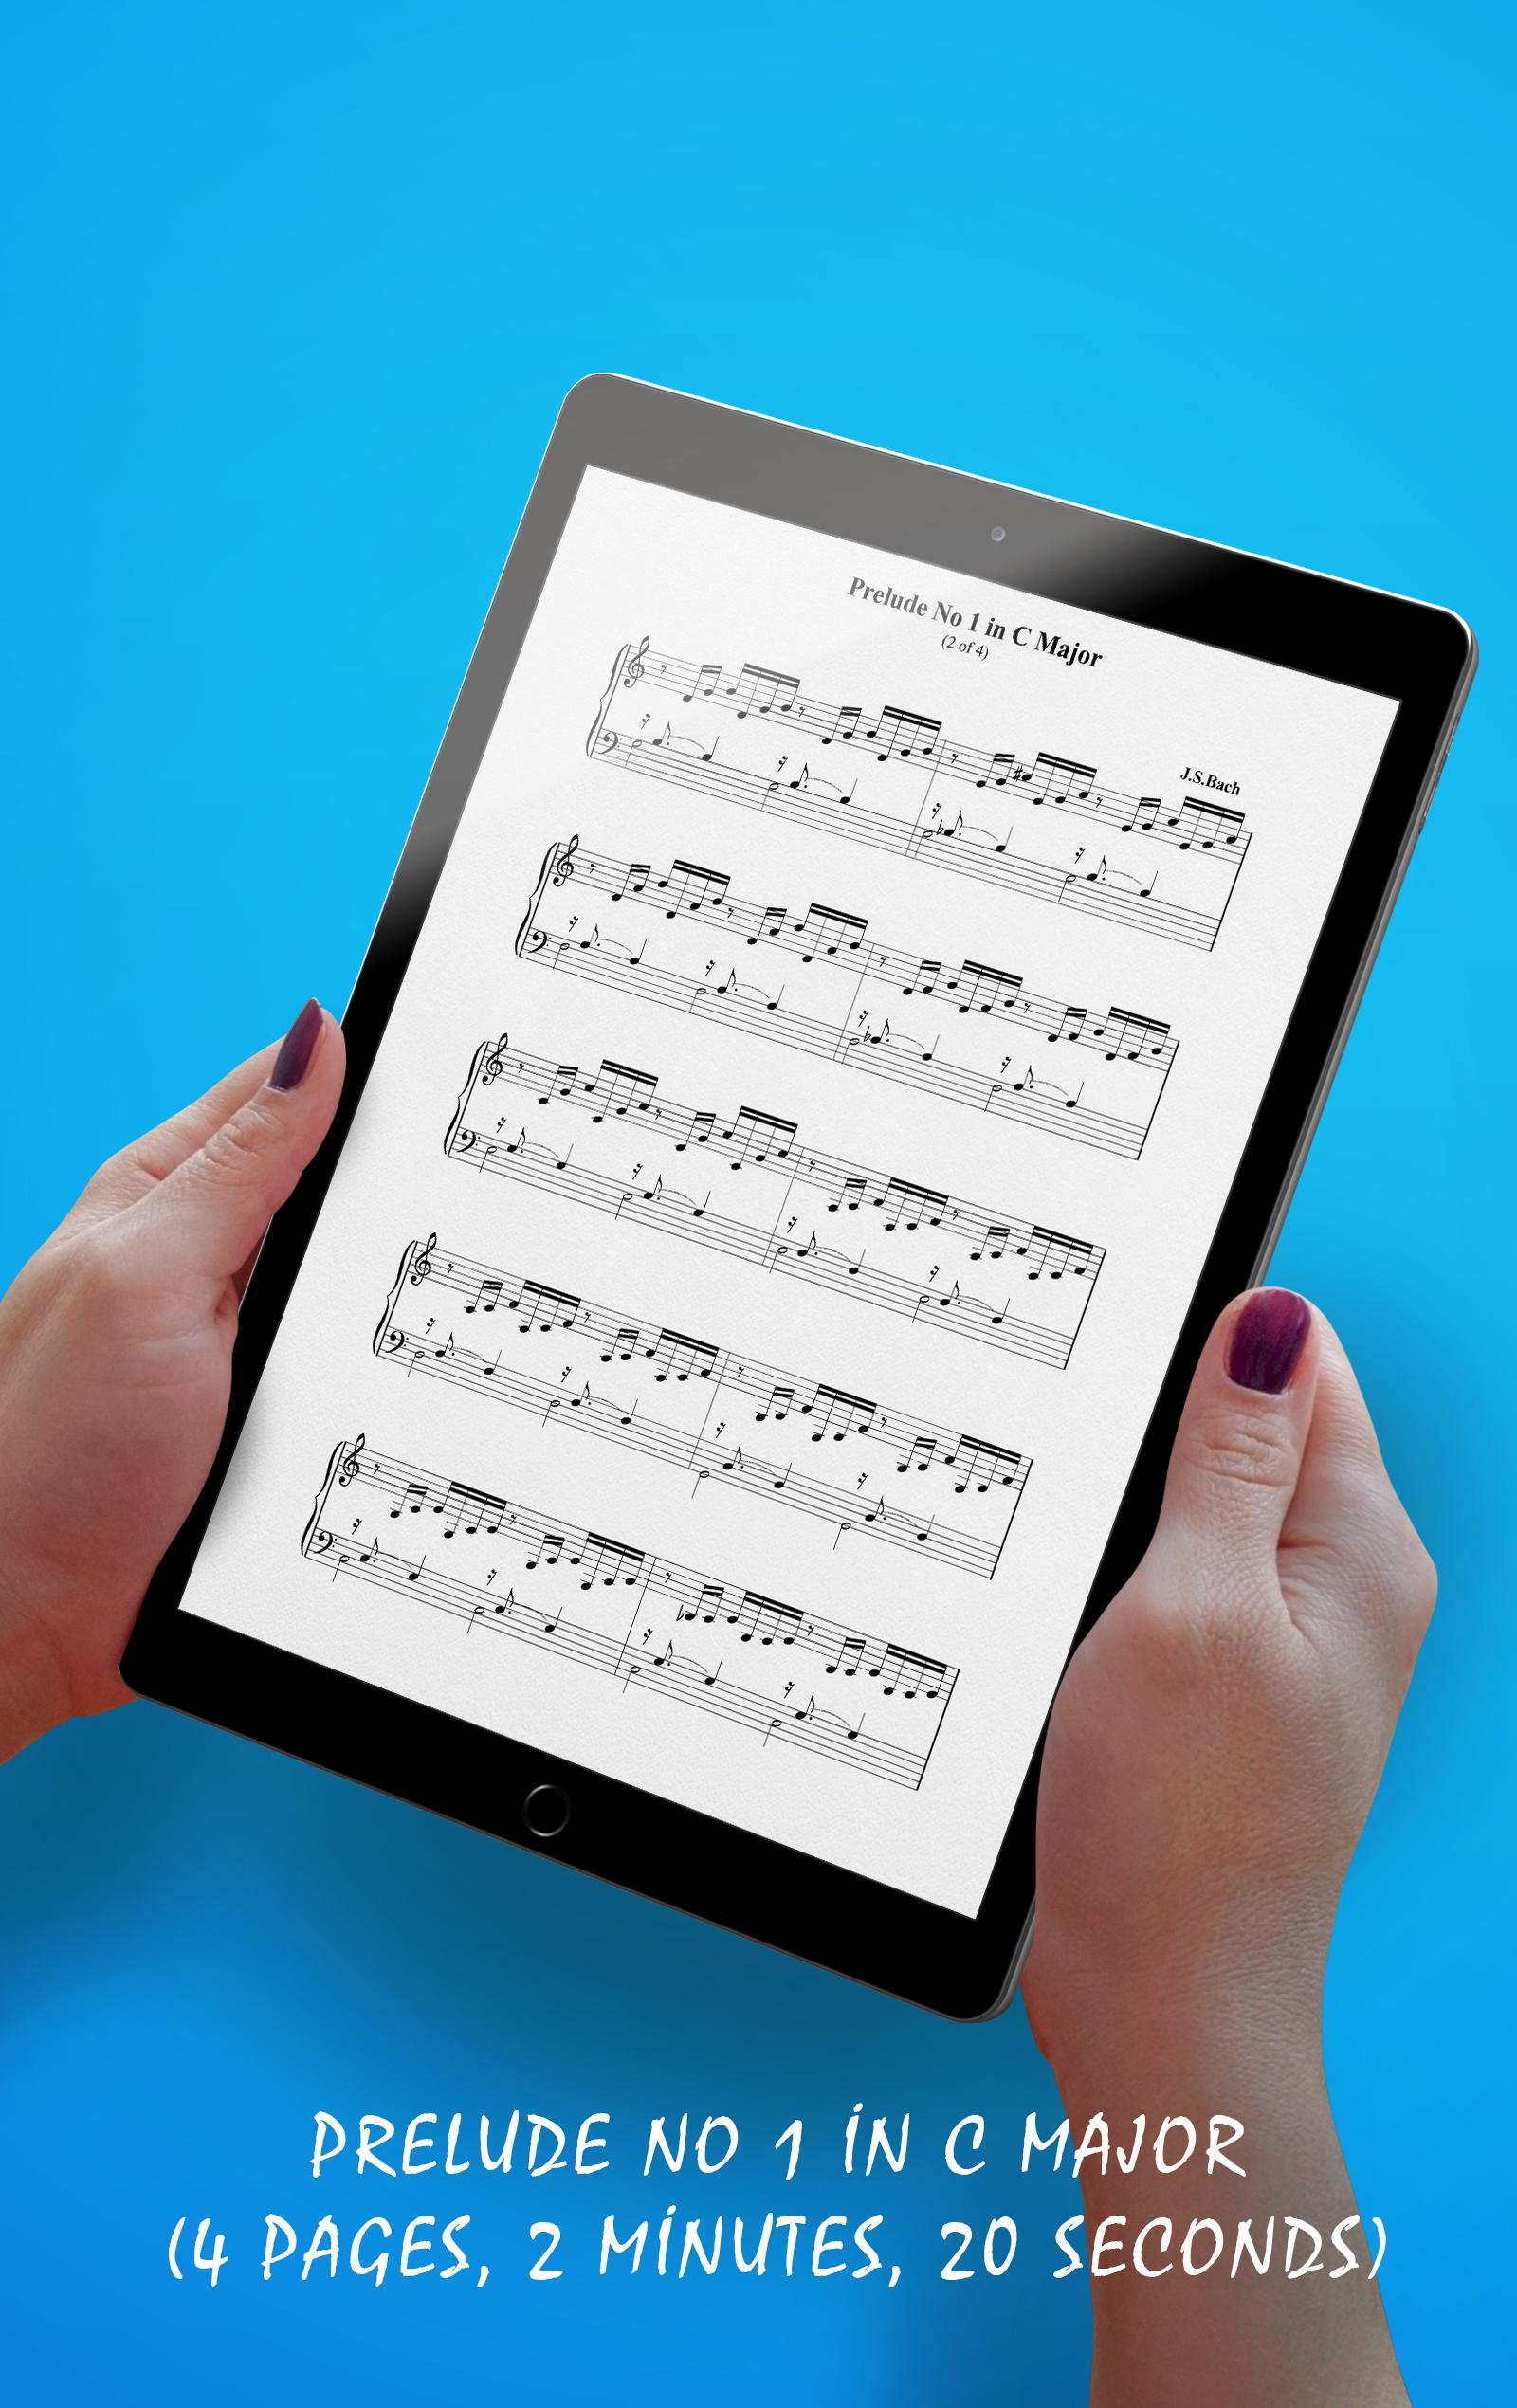 Prelude No 1 C Major Sheet Music (Details)